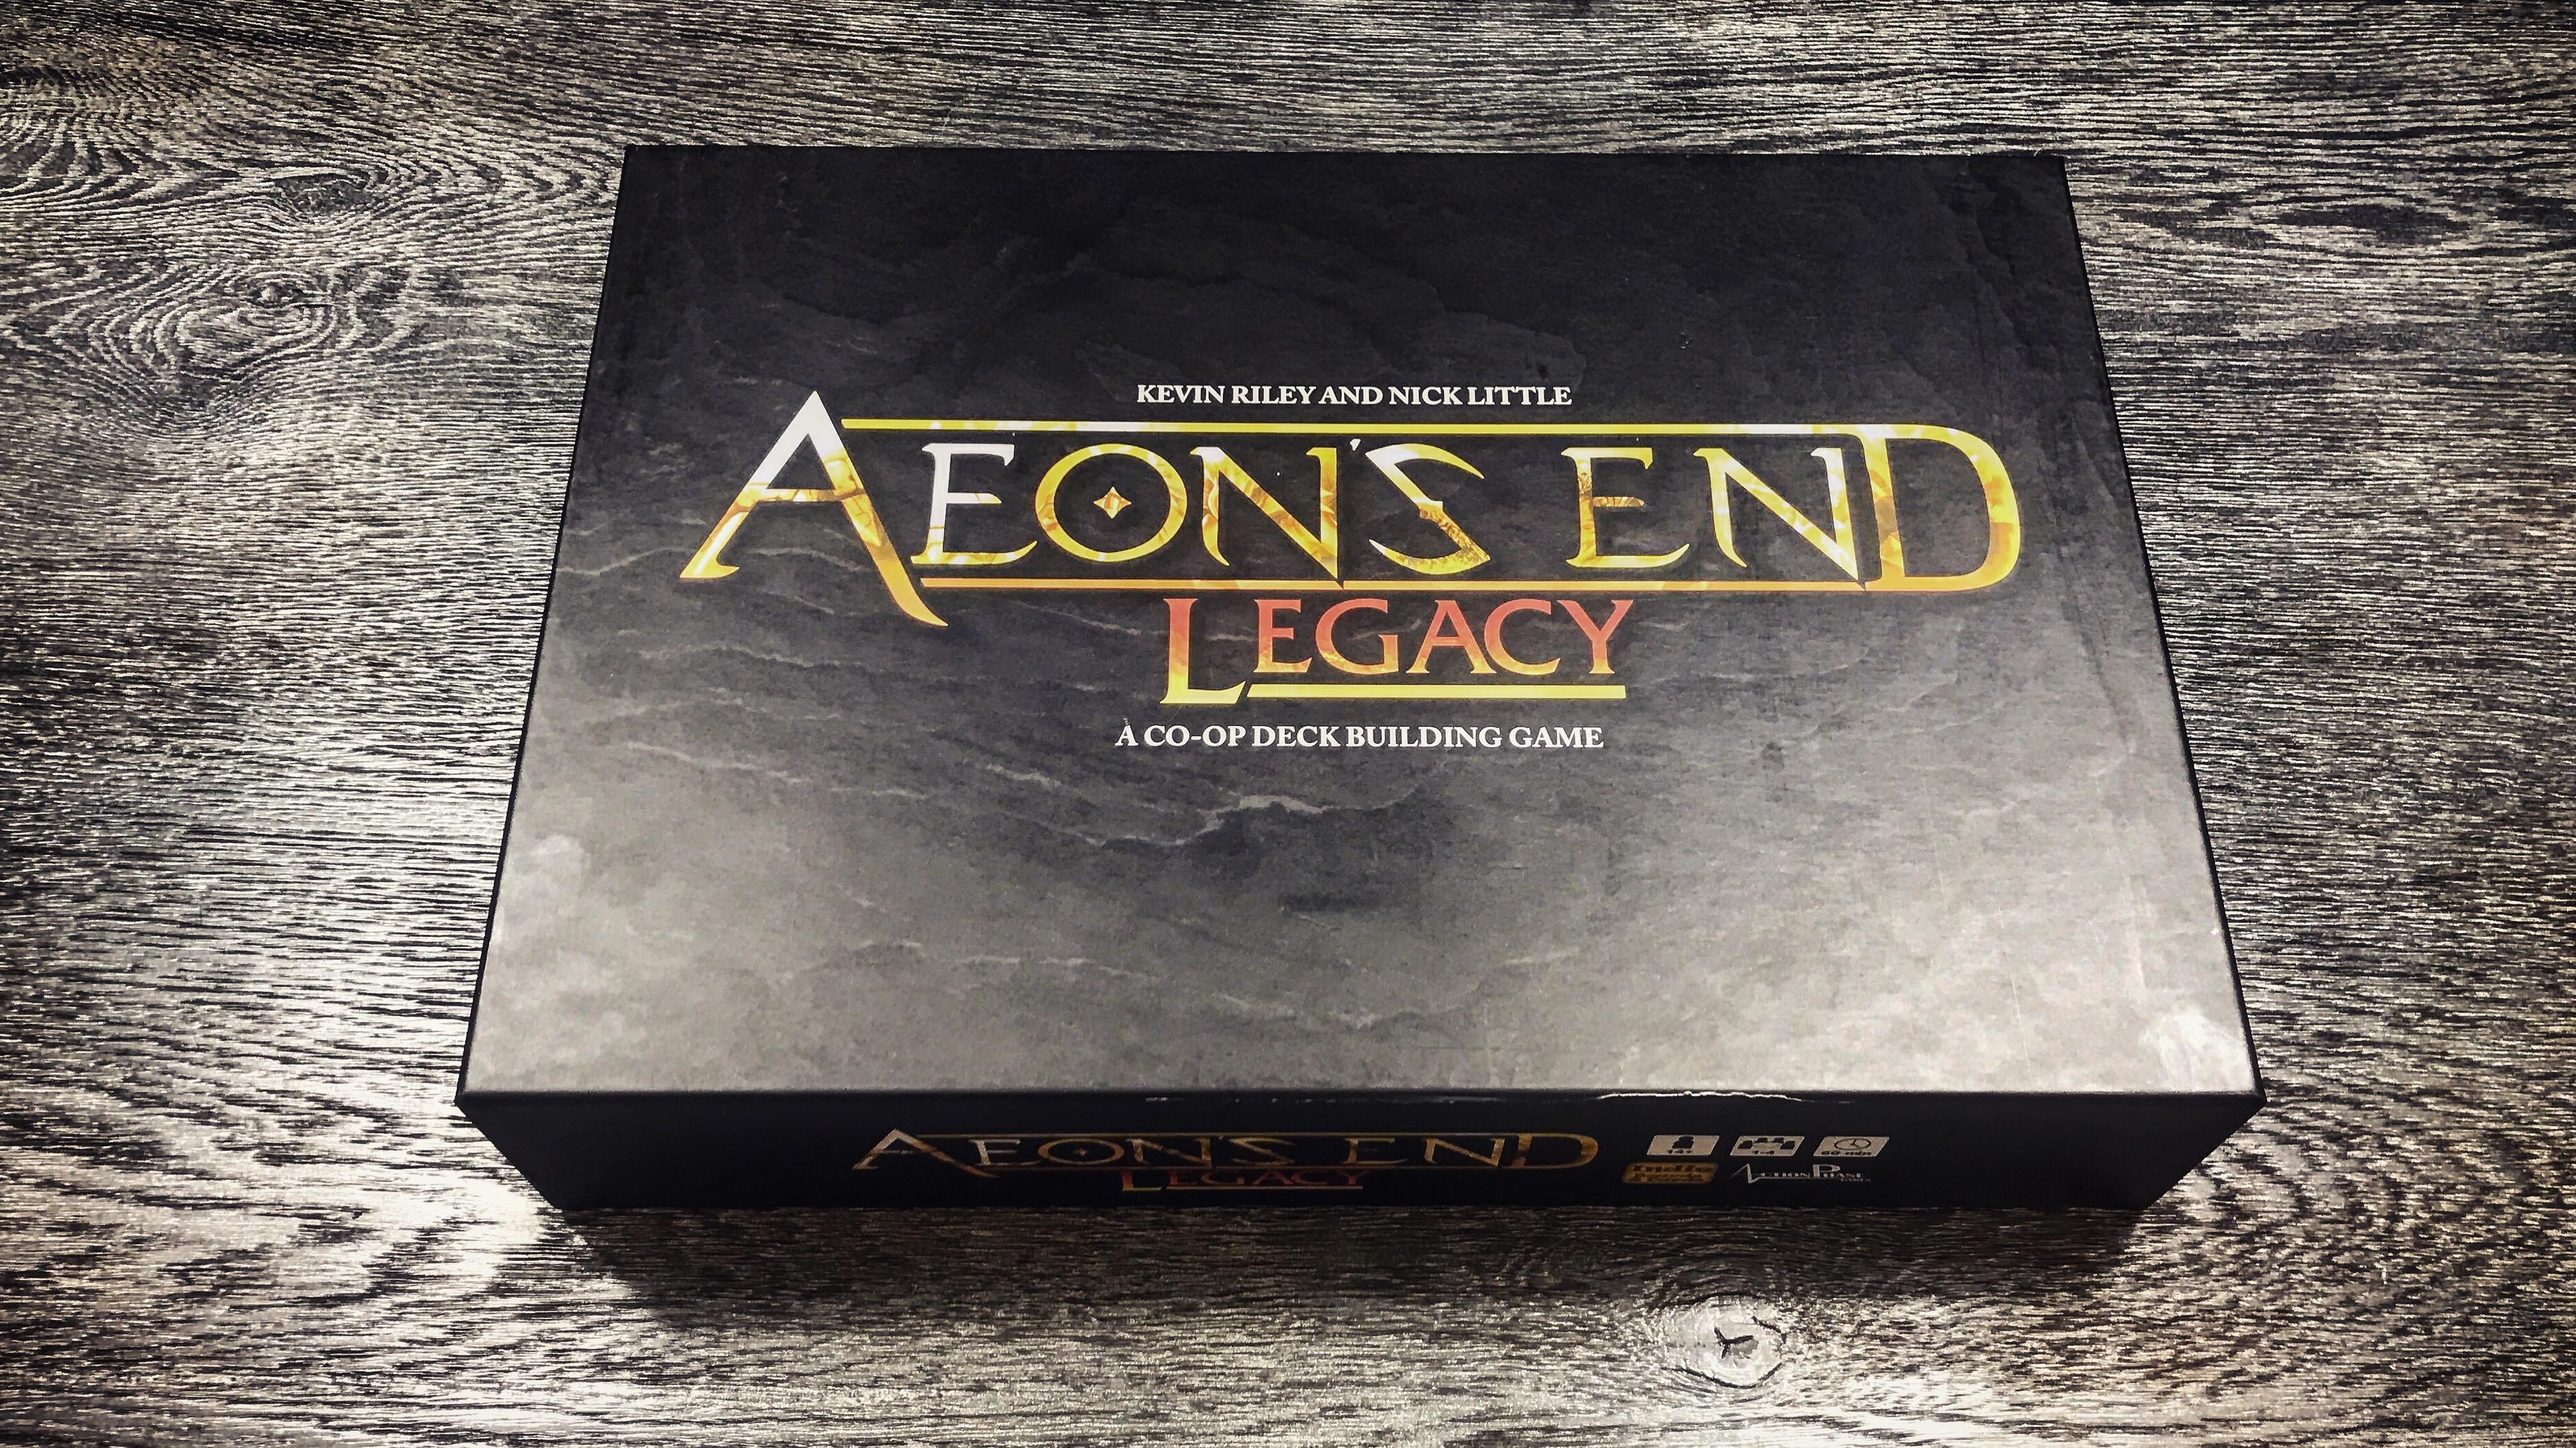 Aeon's End Legacy game box